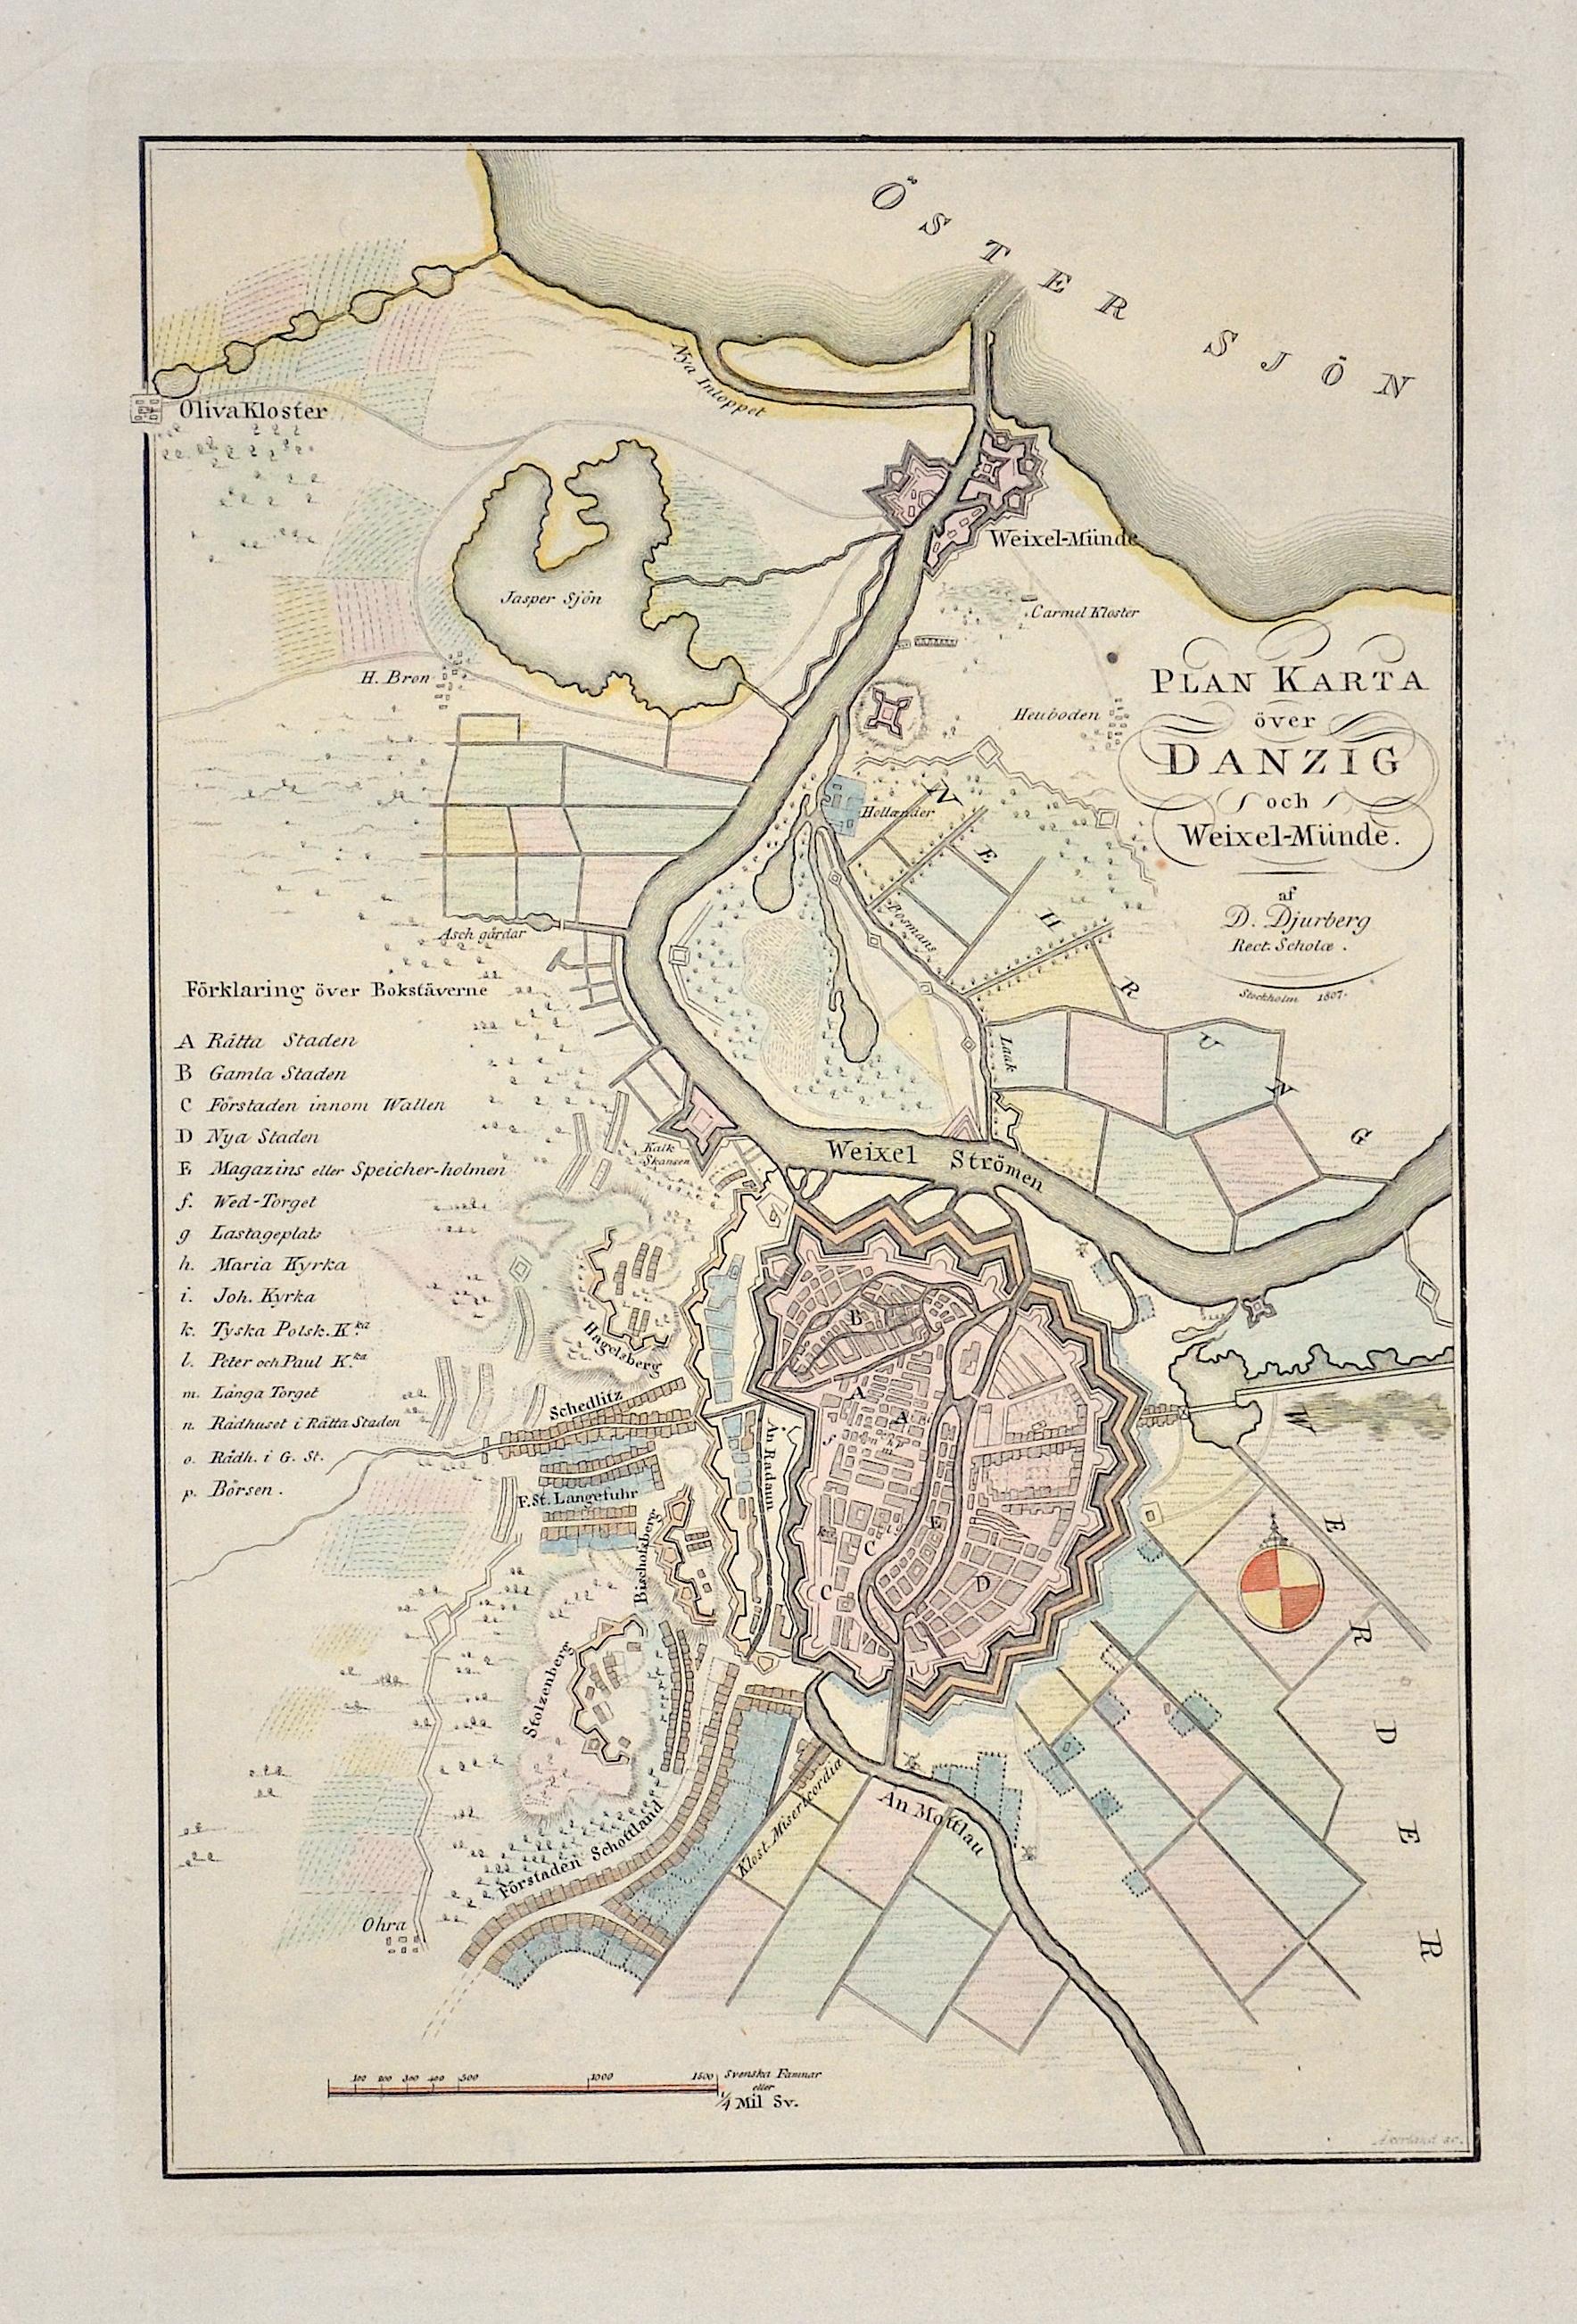 Akerland Erik Plan Karta över Danzig och Weixel-Münde.